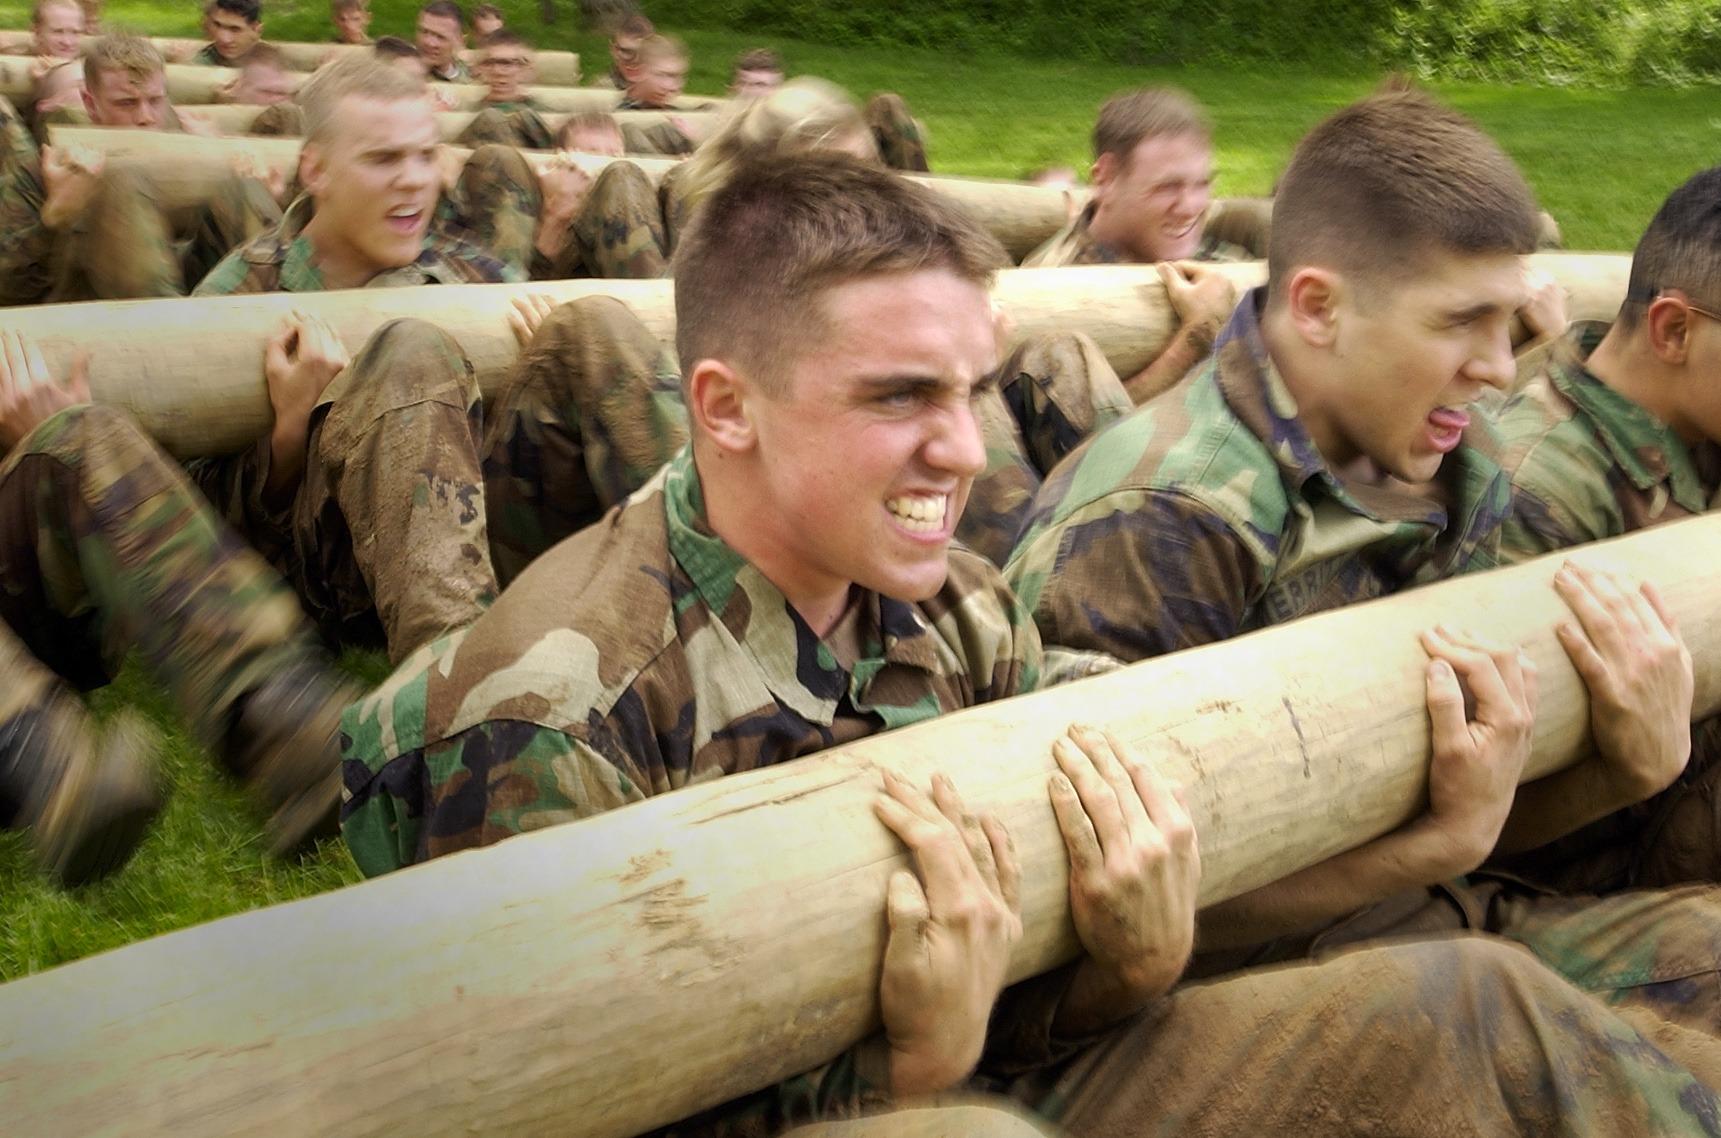 us-naval-academy-80391.jpg